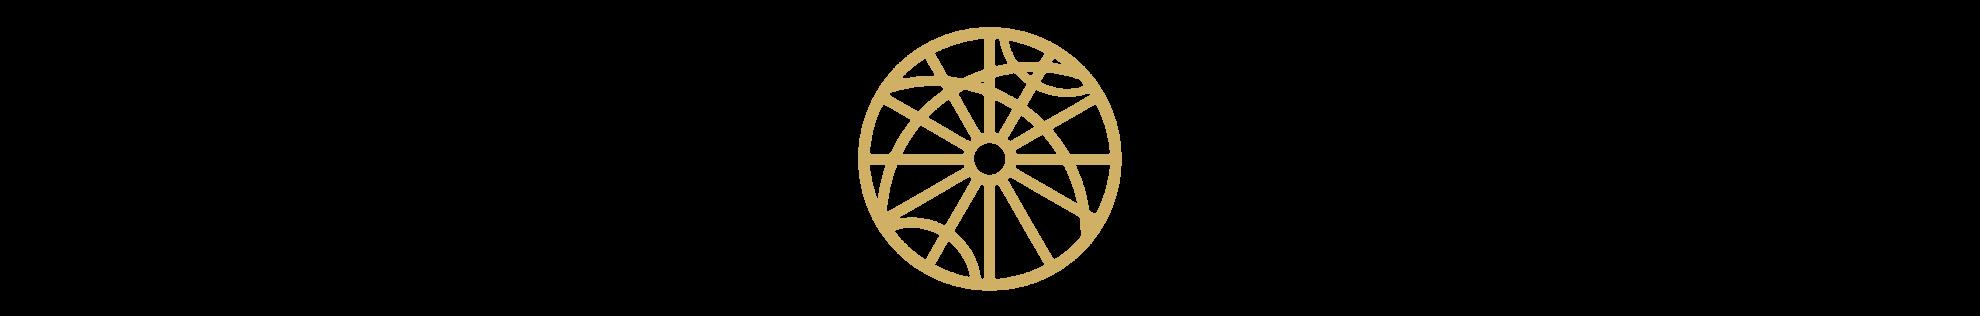 high road spirits logo globe